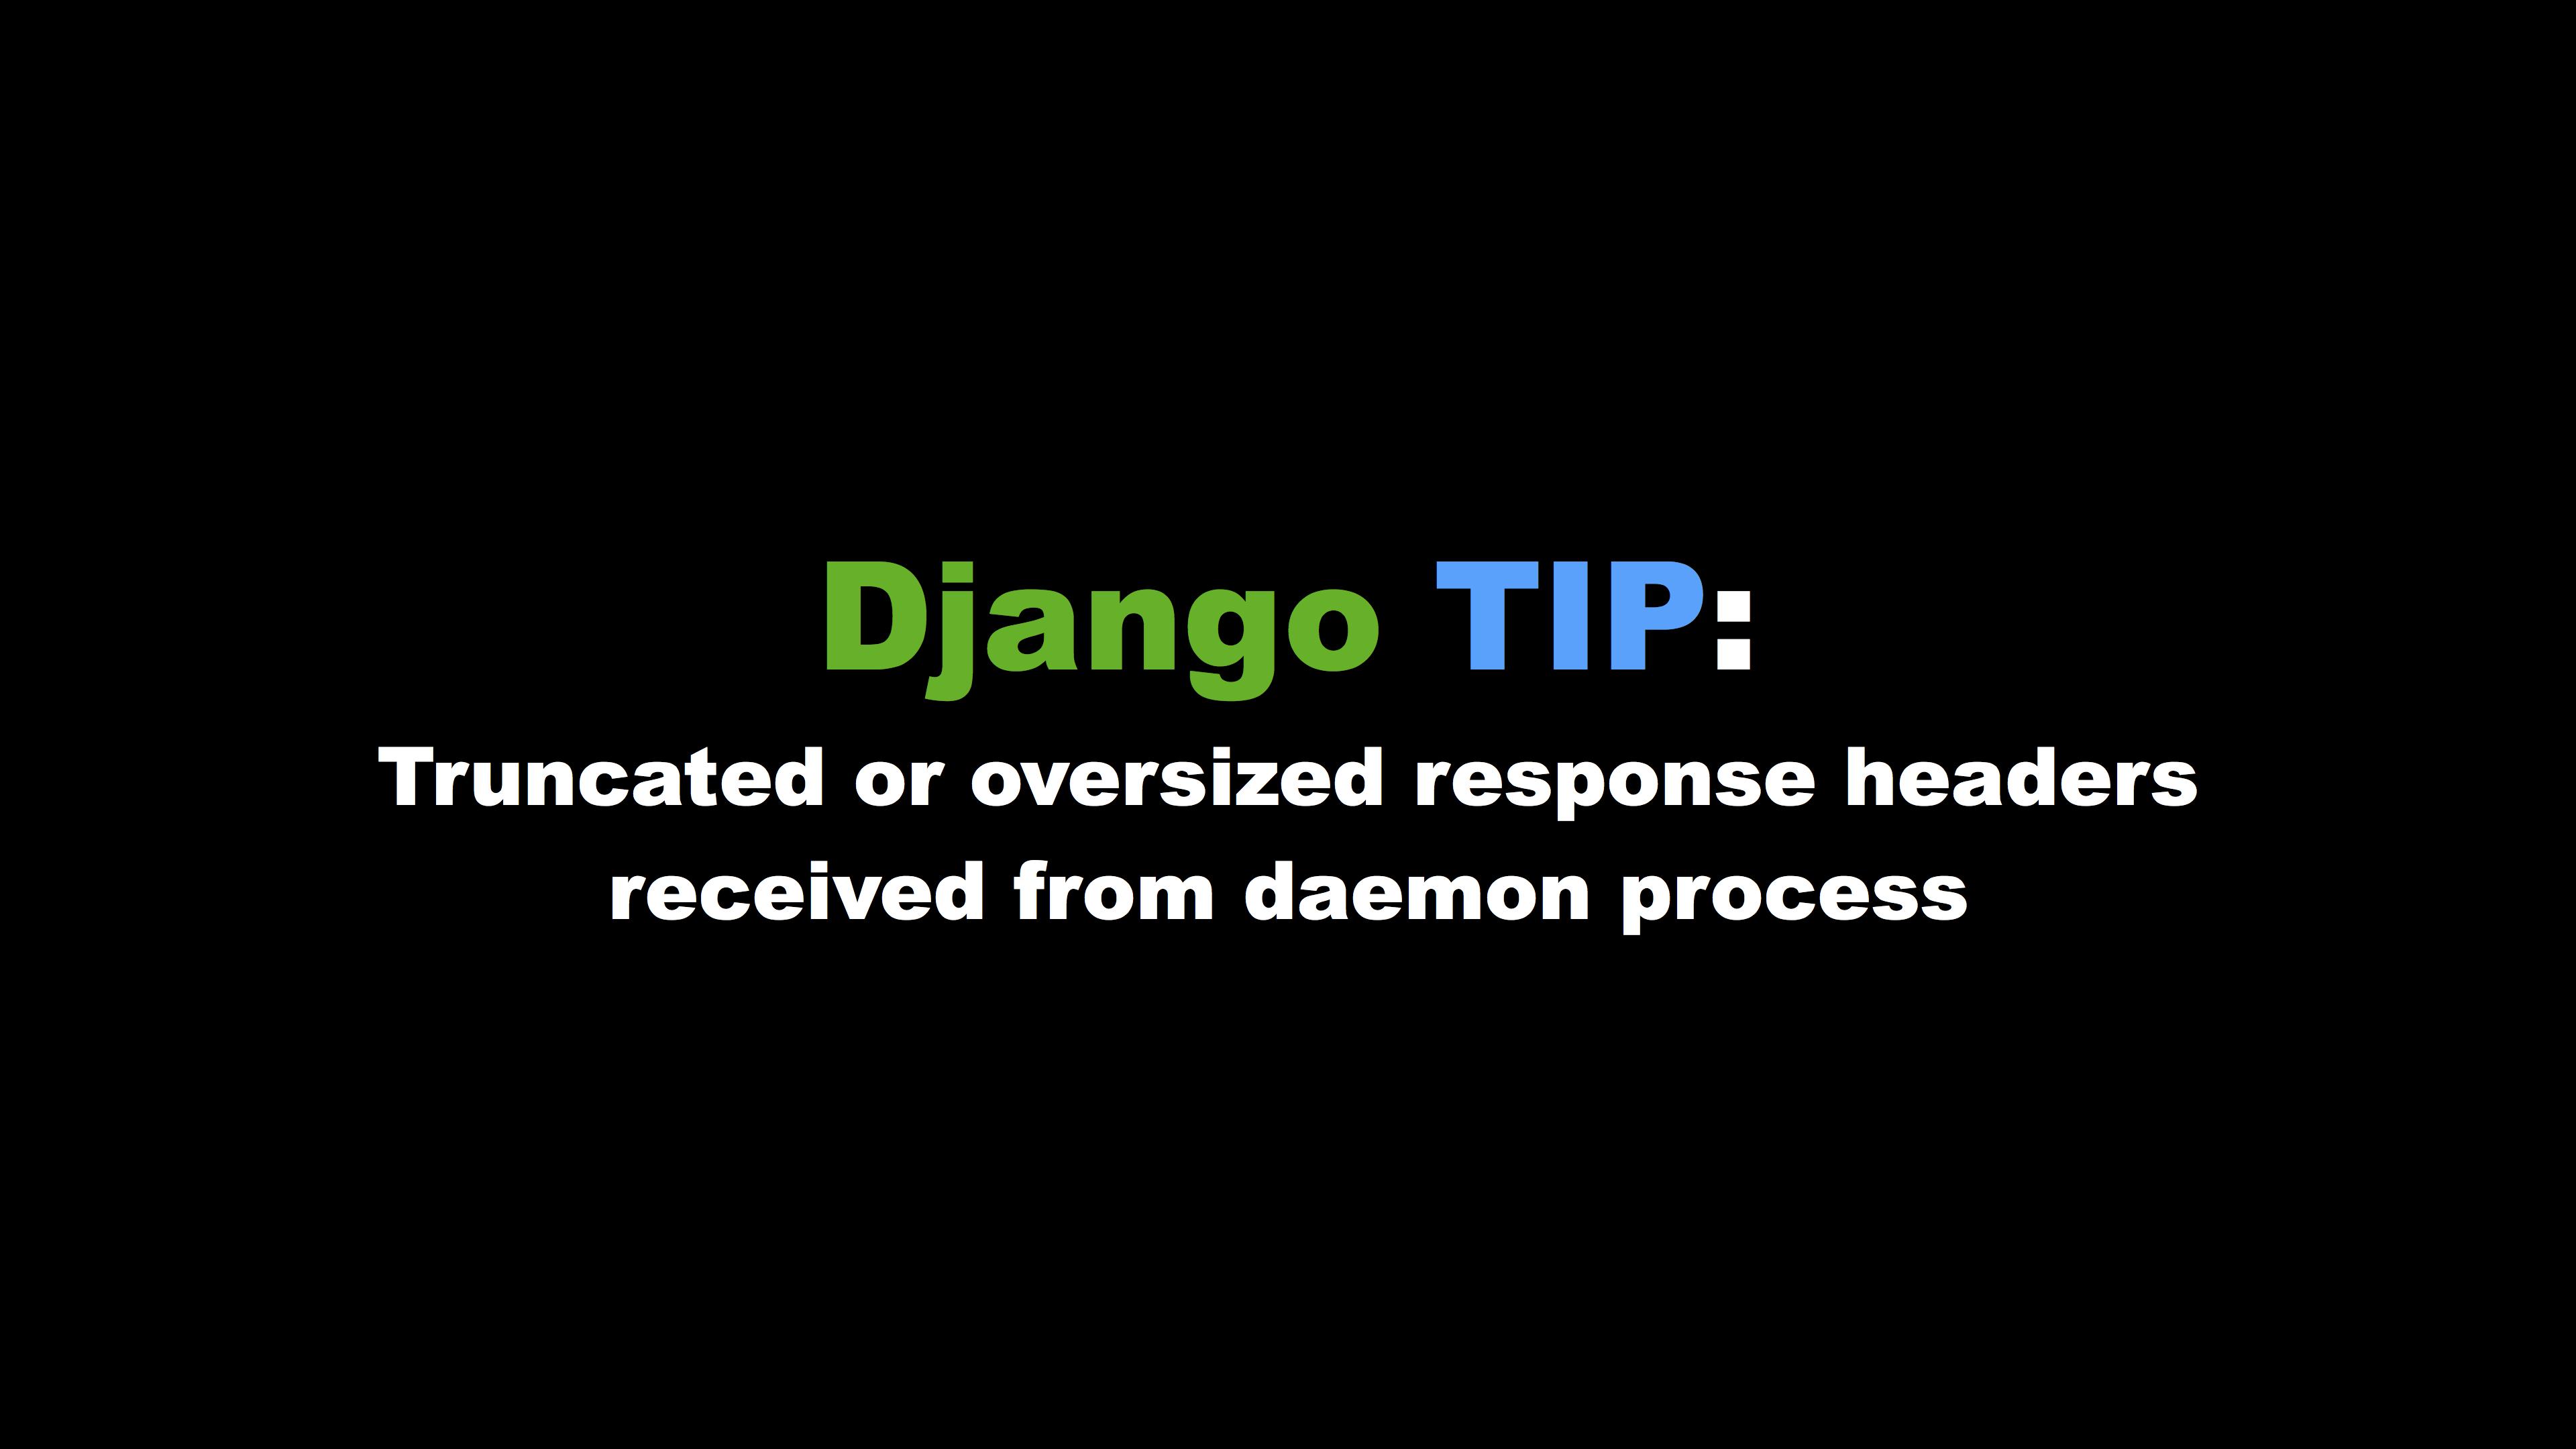 Django: Truncated or oversized response headers received from daemon process 에러 해결법